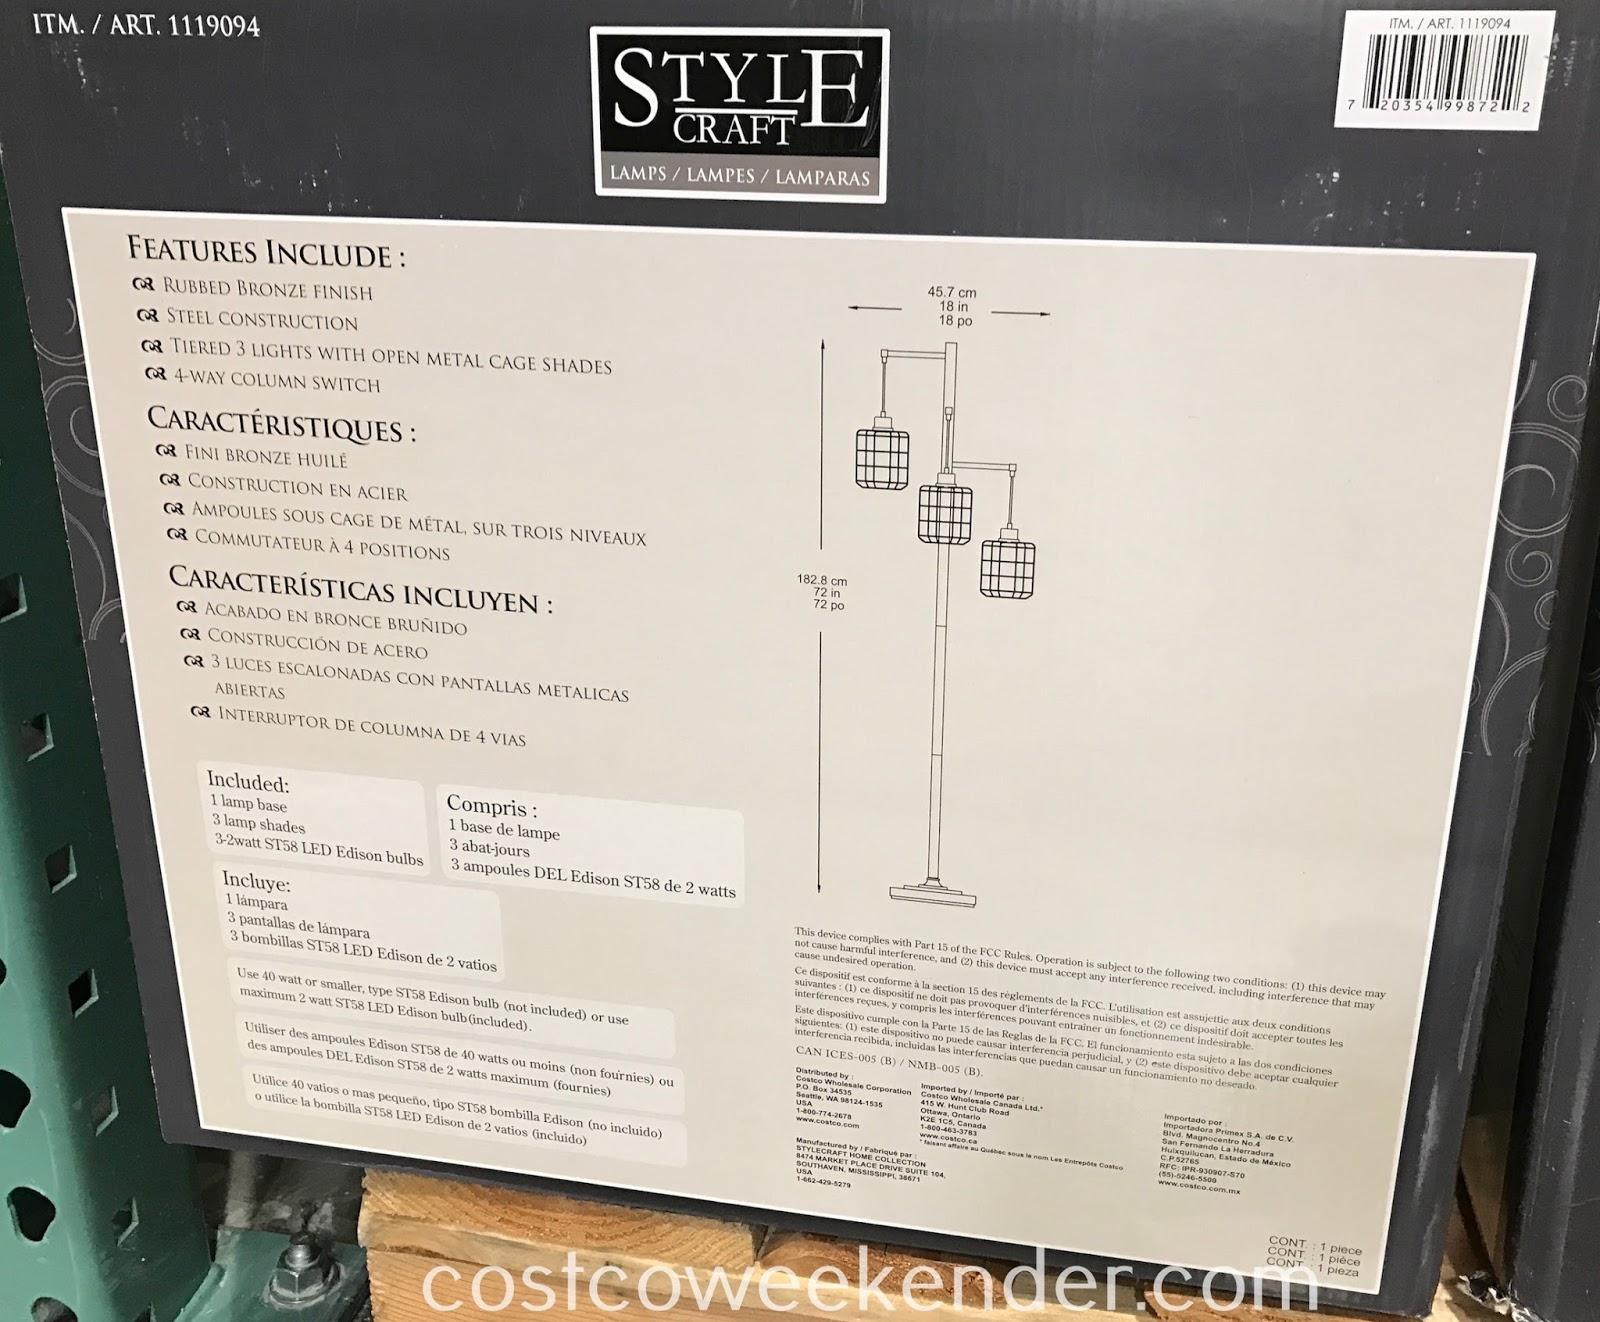 StyleCraft 3-Light Floor Lamp: modern technology with a retro look